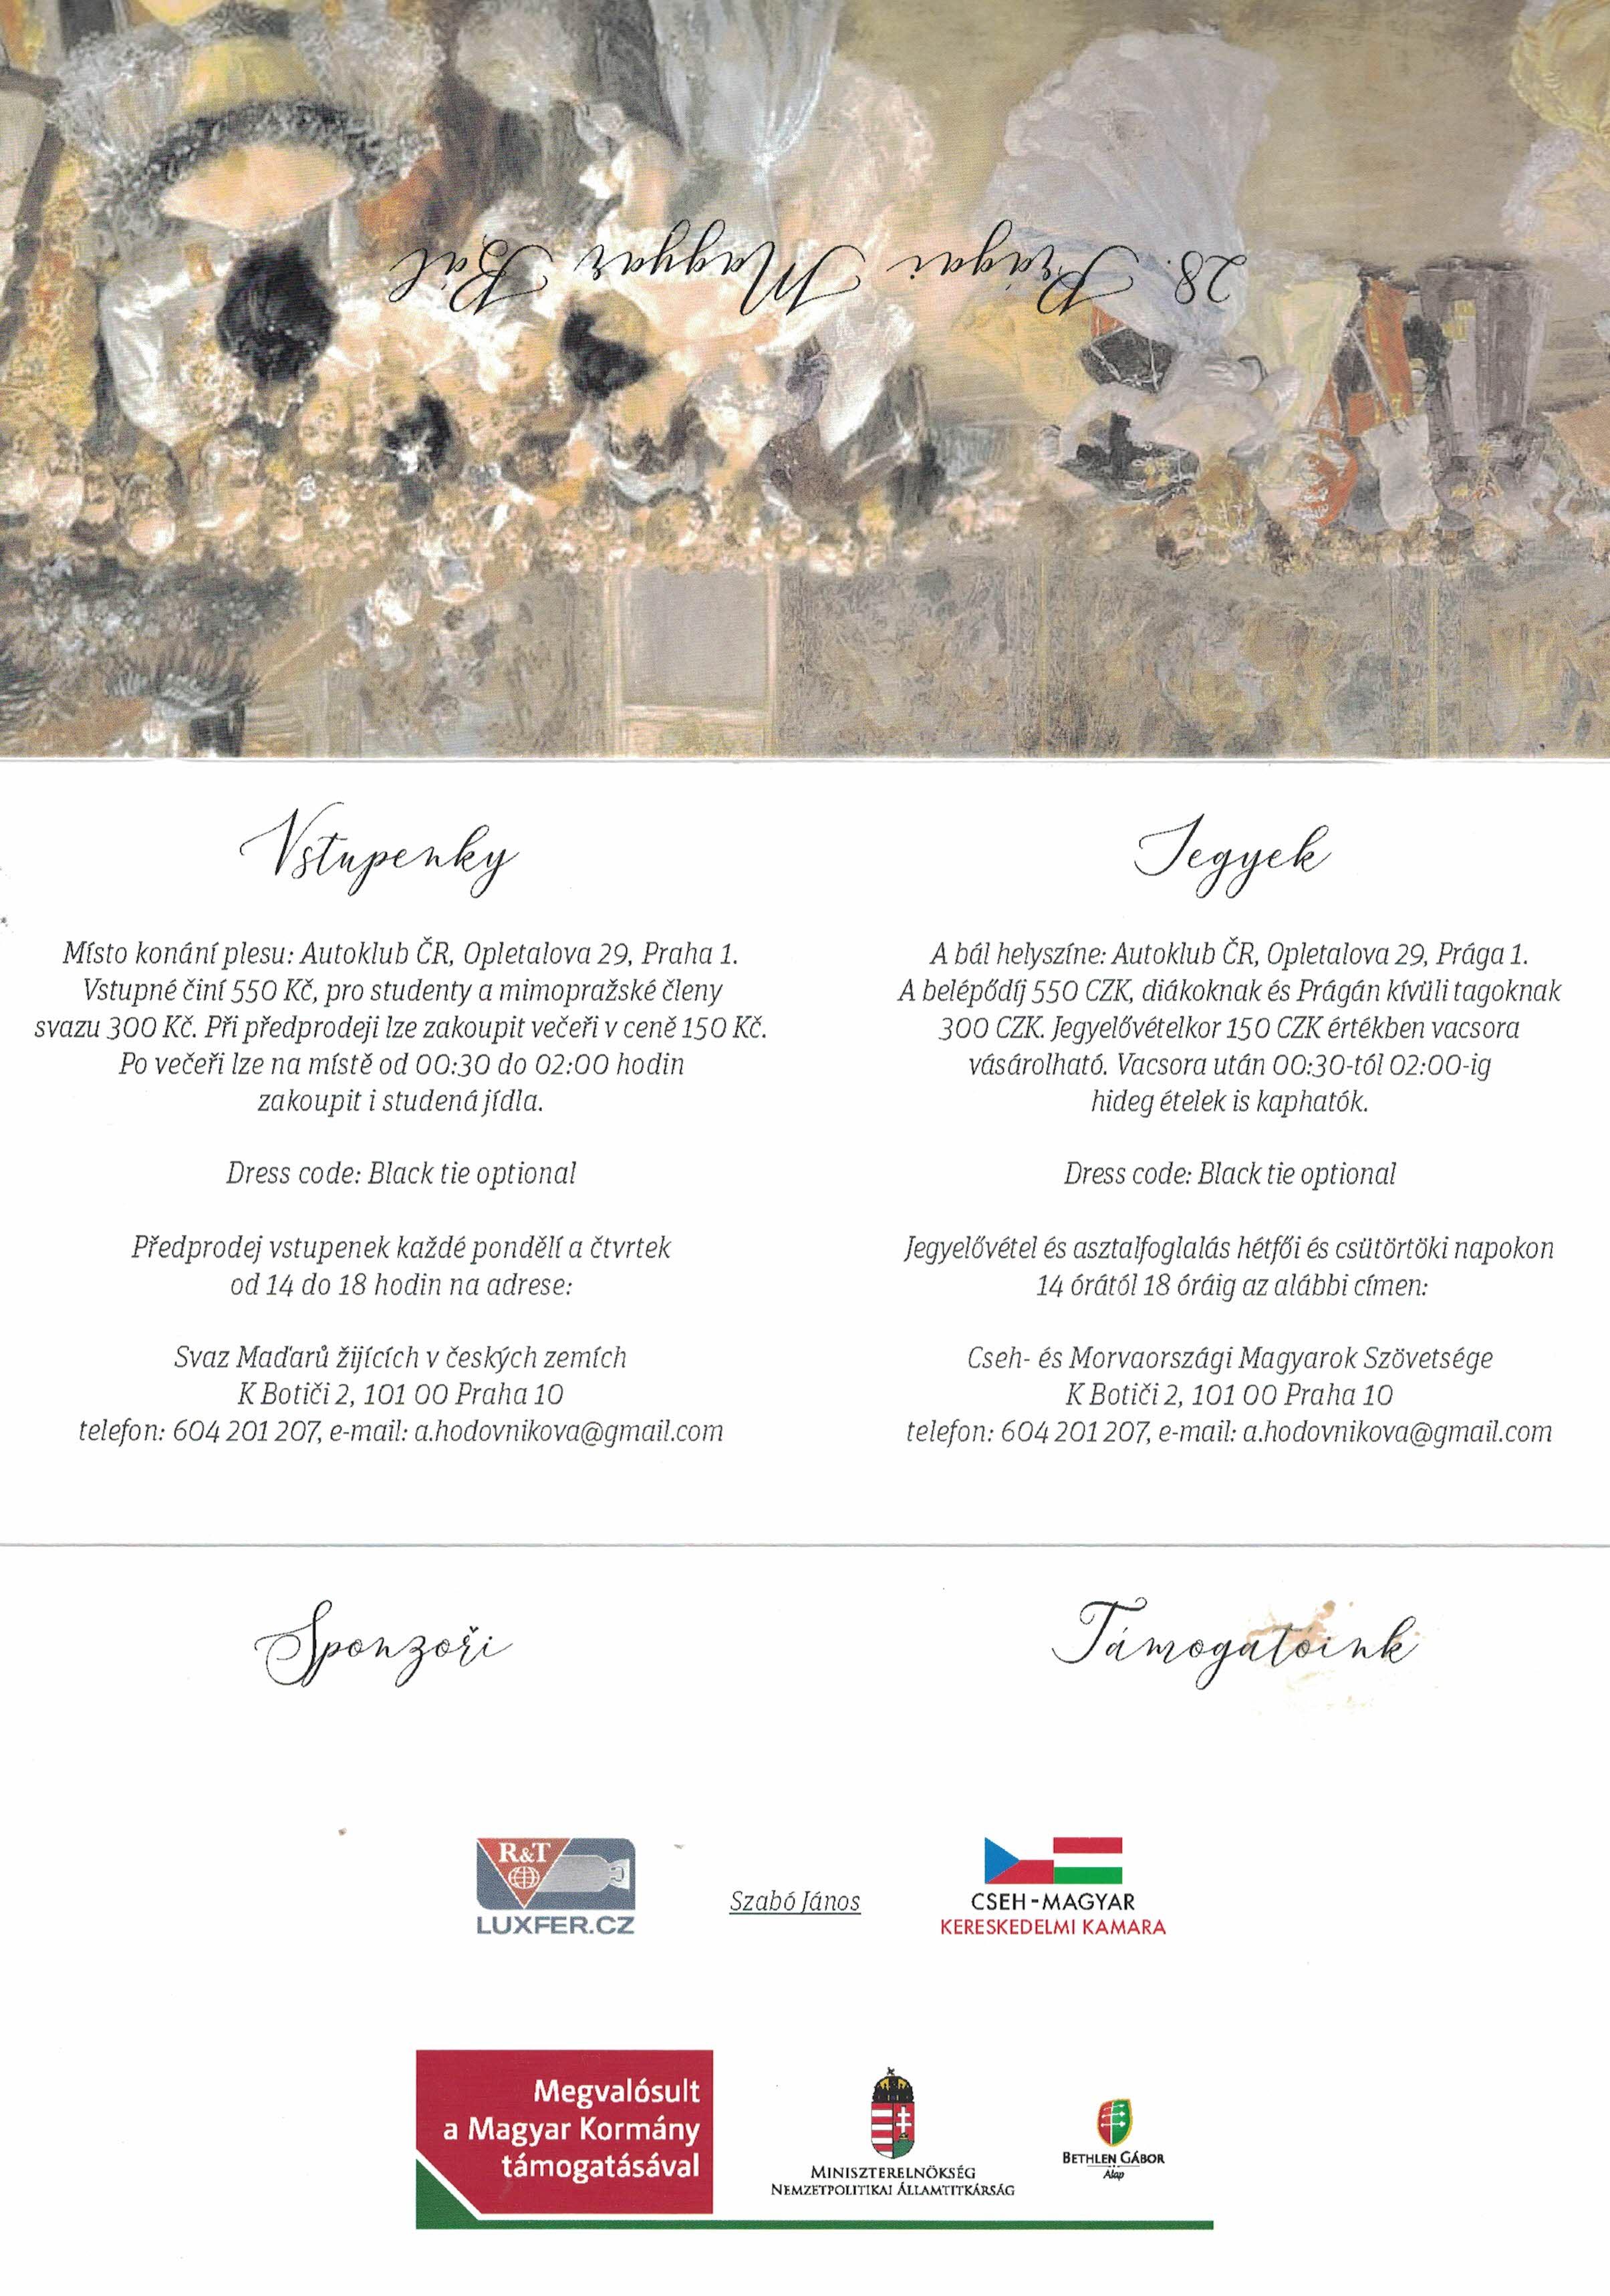 Magyar bál program